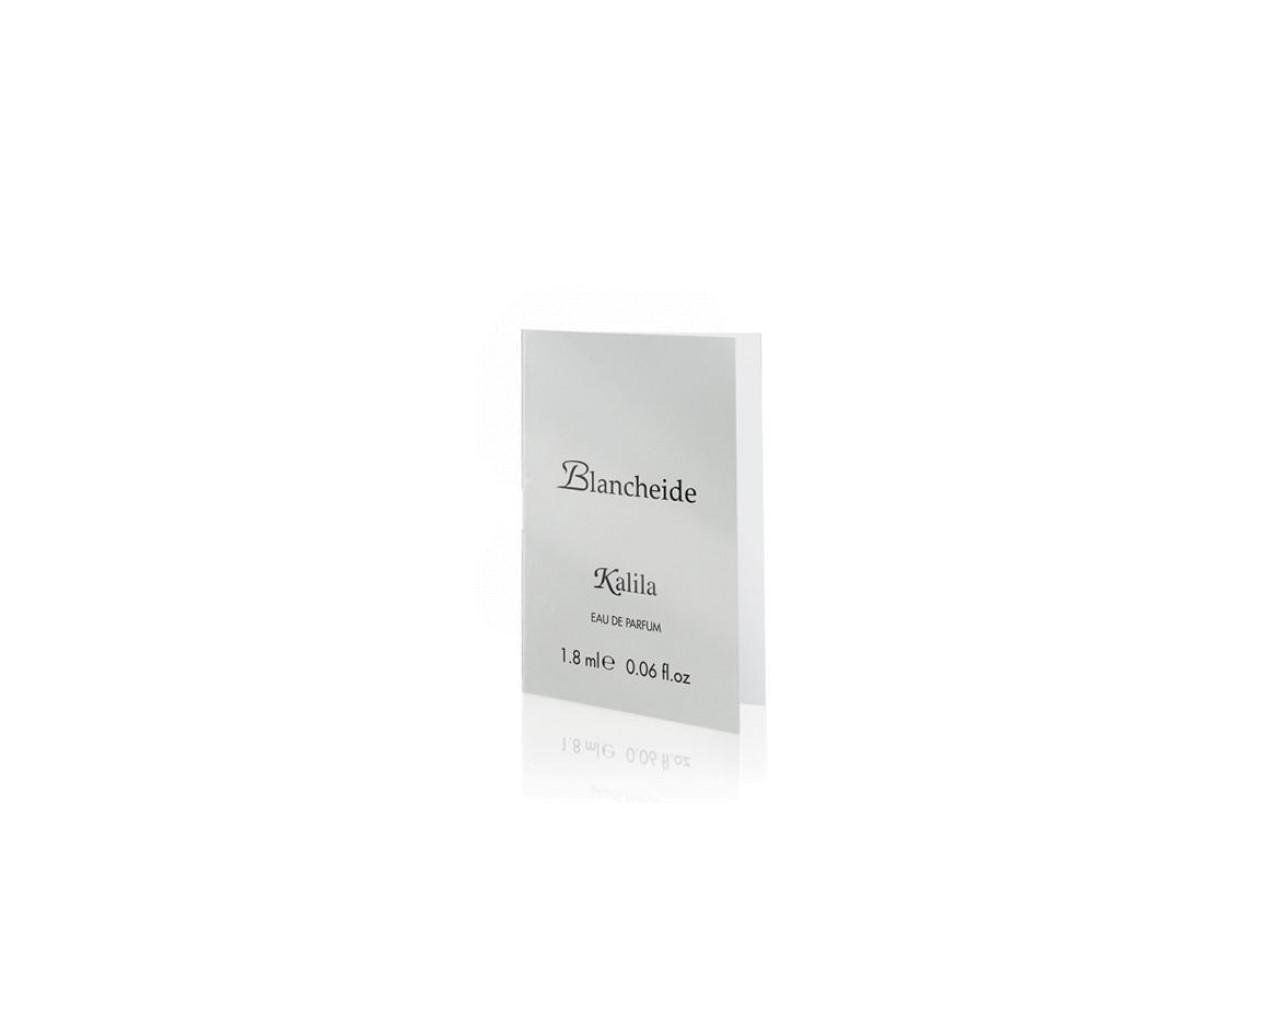 Campioncino Kalila Blancheide EDP 1,8 ml Blancheide BLAS001KA-02